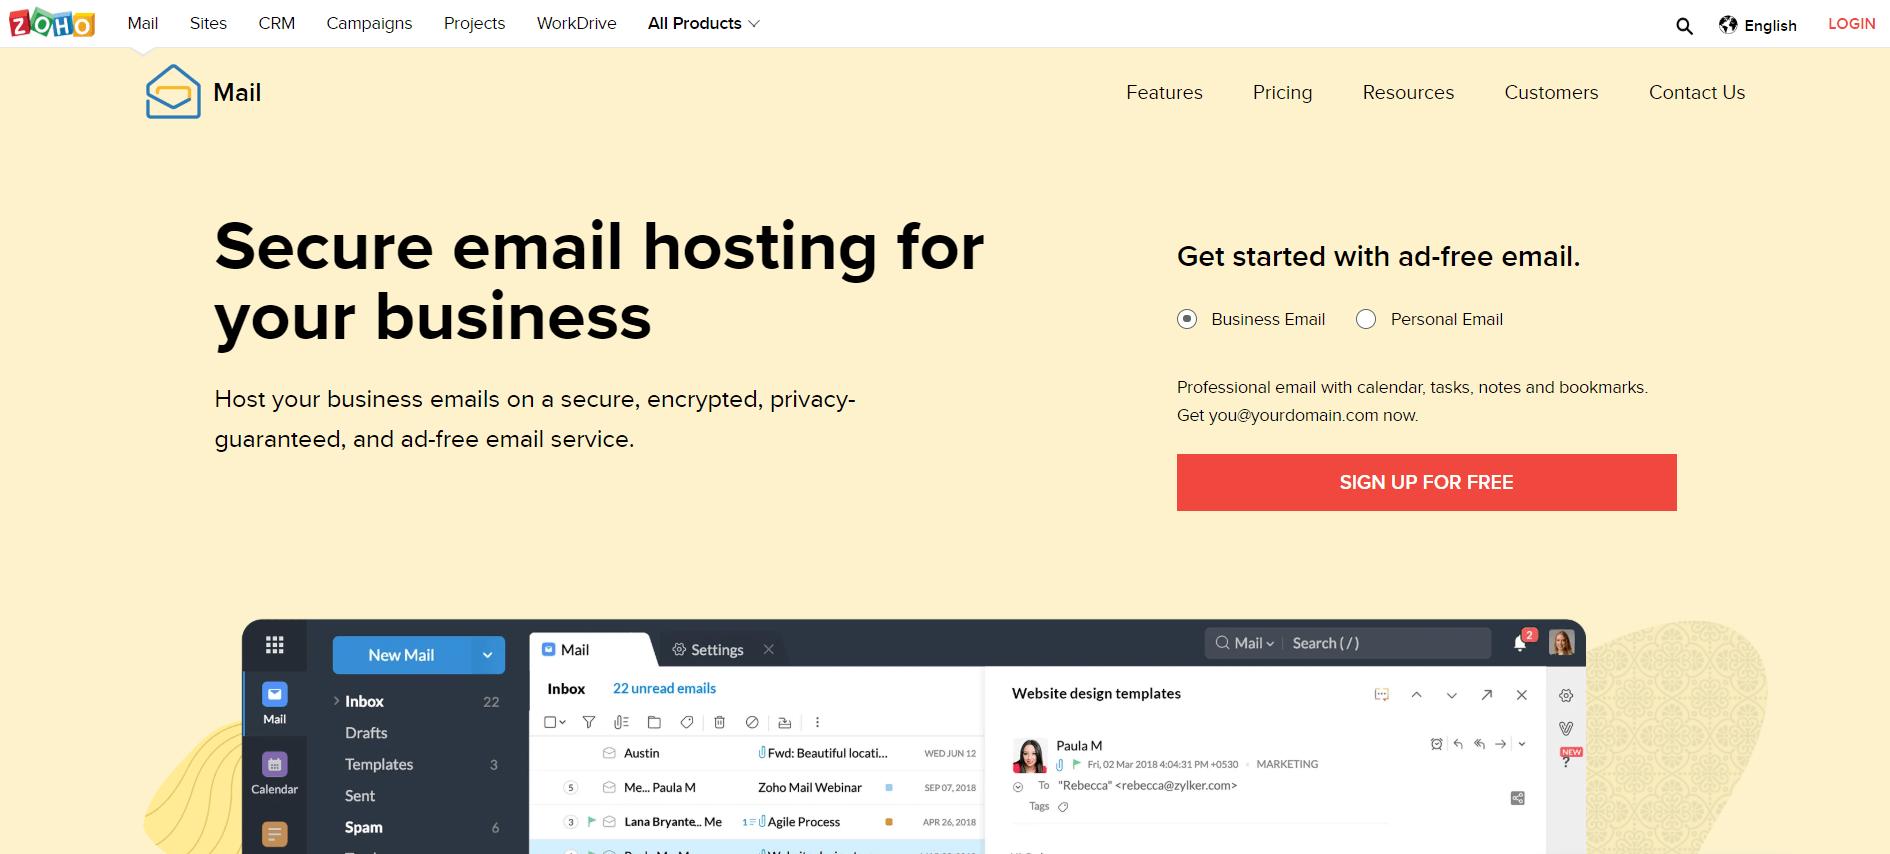 Zoho Mail email marketing platform